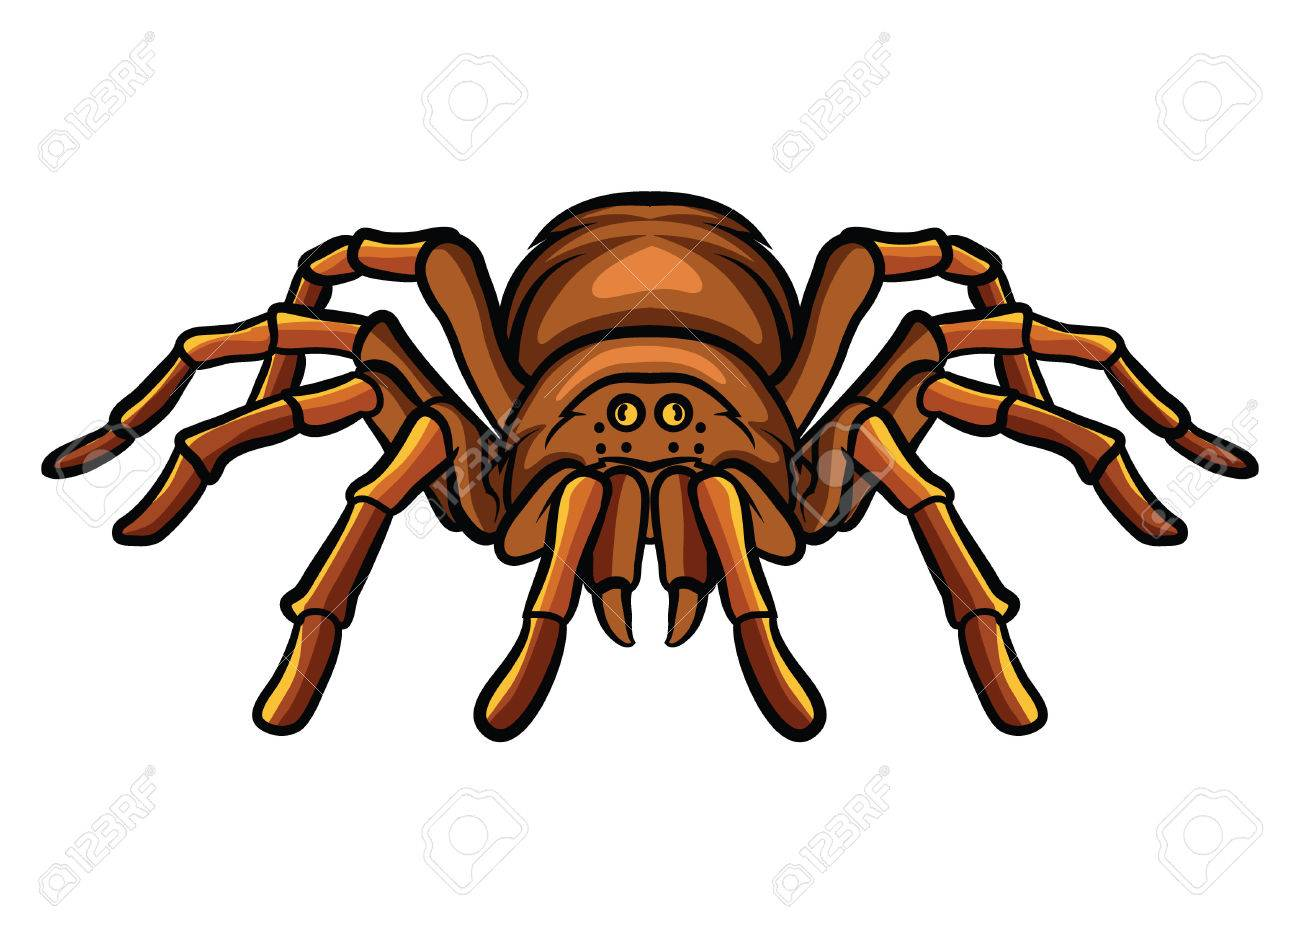 Tarantula Royalty Free Cliparts, Vectors, And Stock Illustration ...